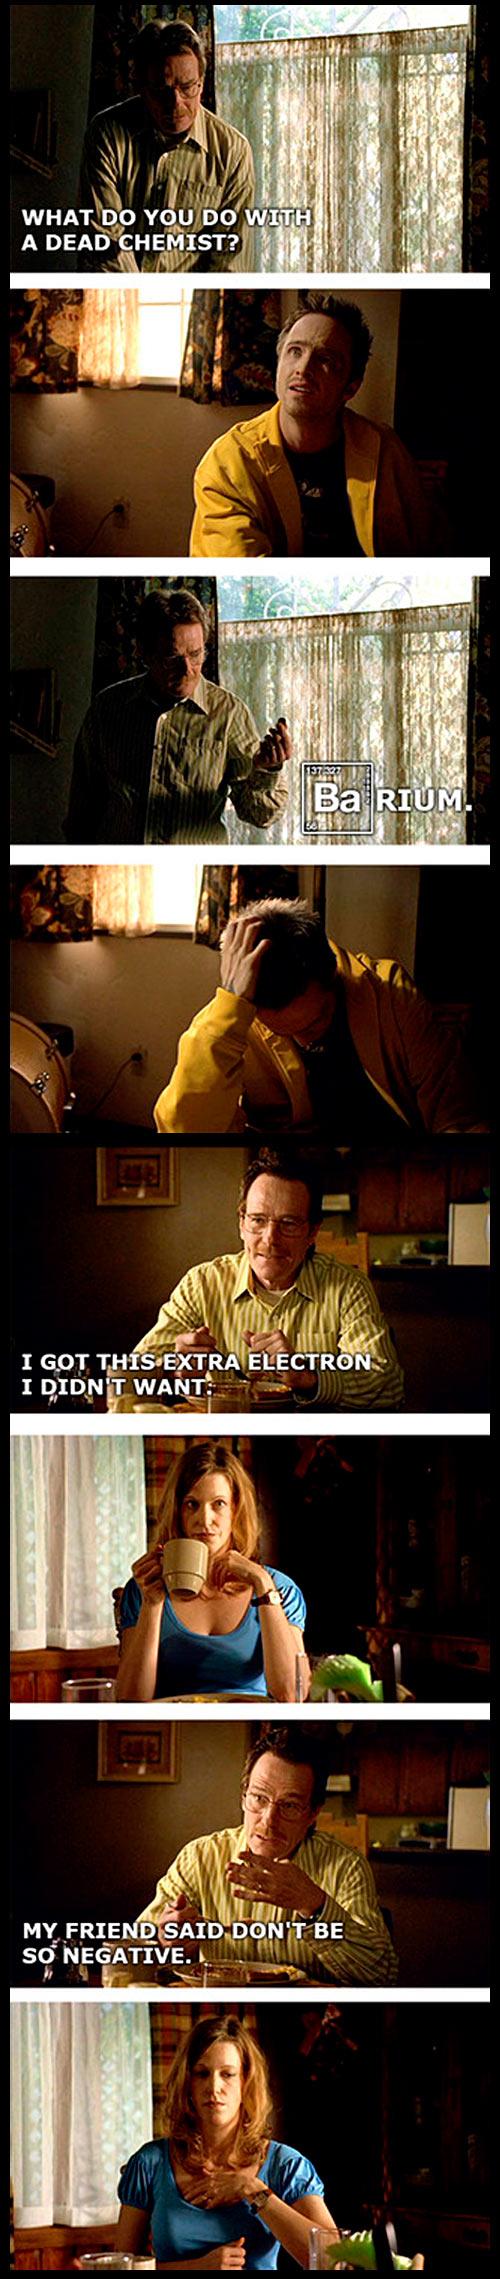 funny-Walter-White-Breaking-Bad-chemistry